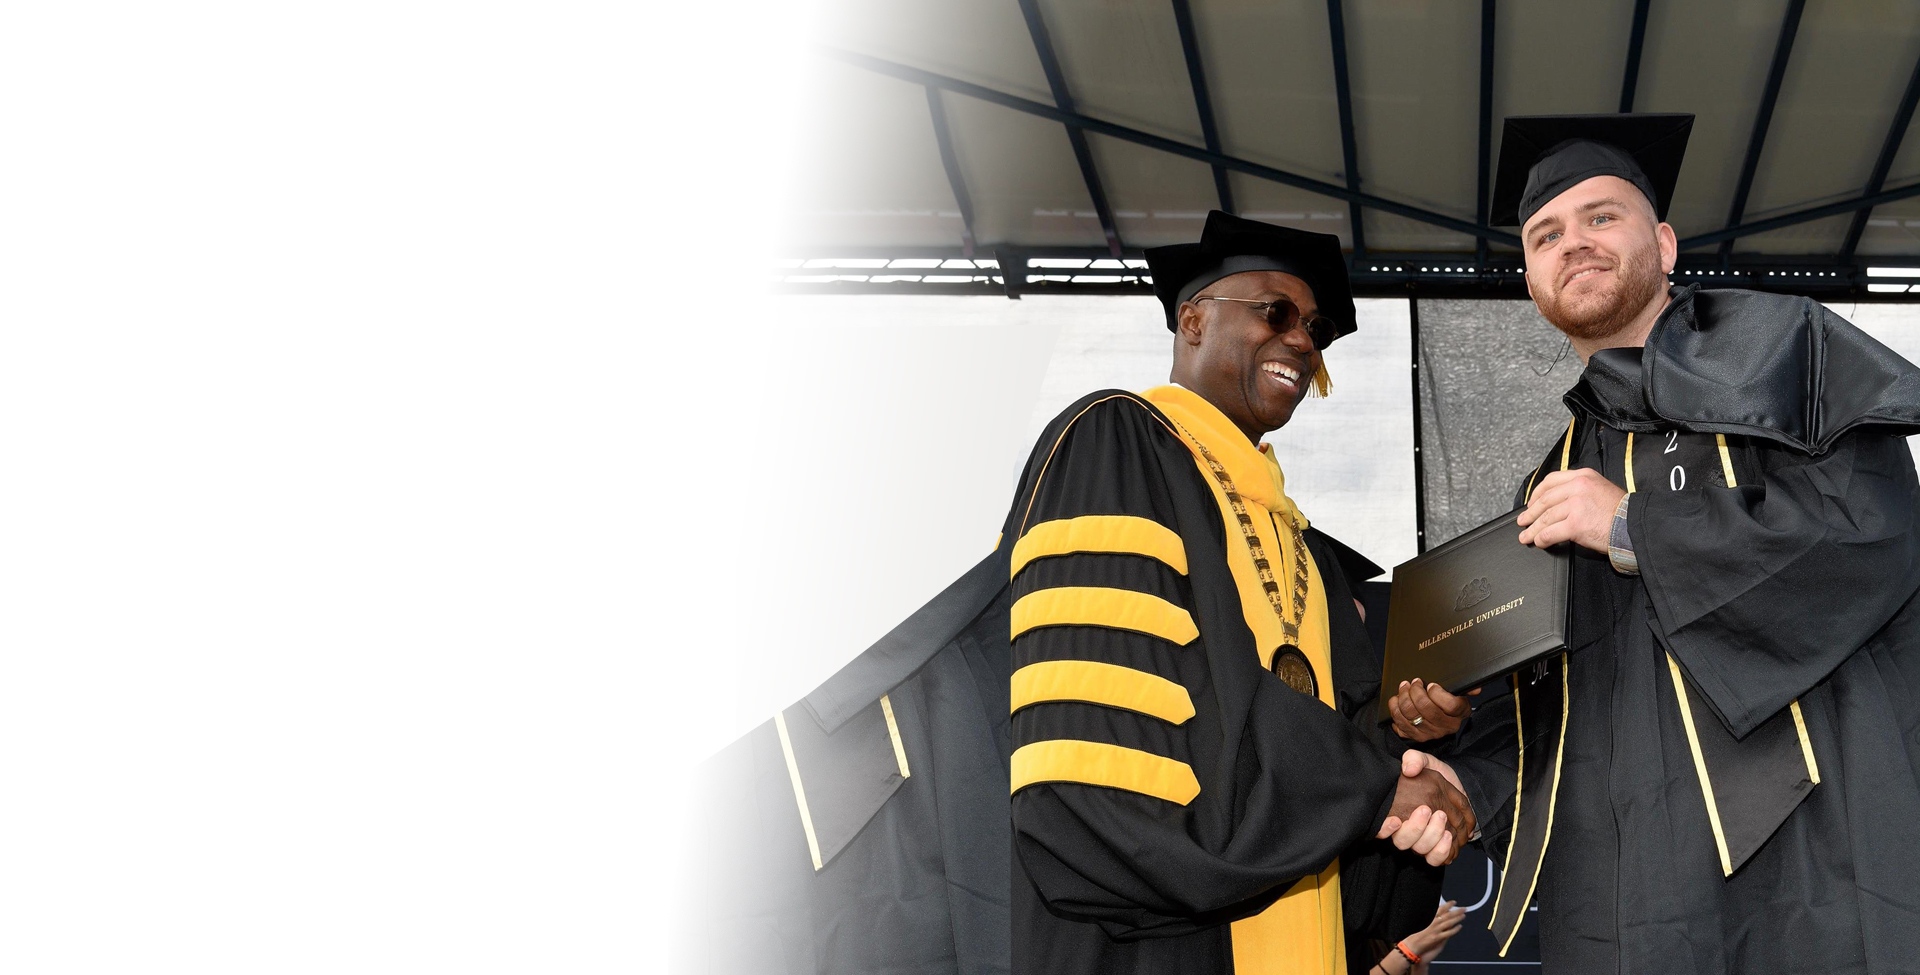 Curtis Graduation Photo